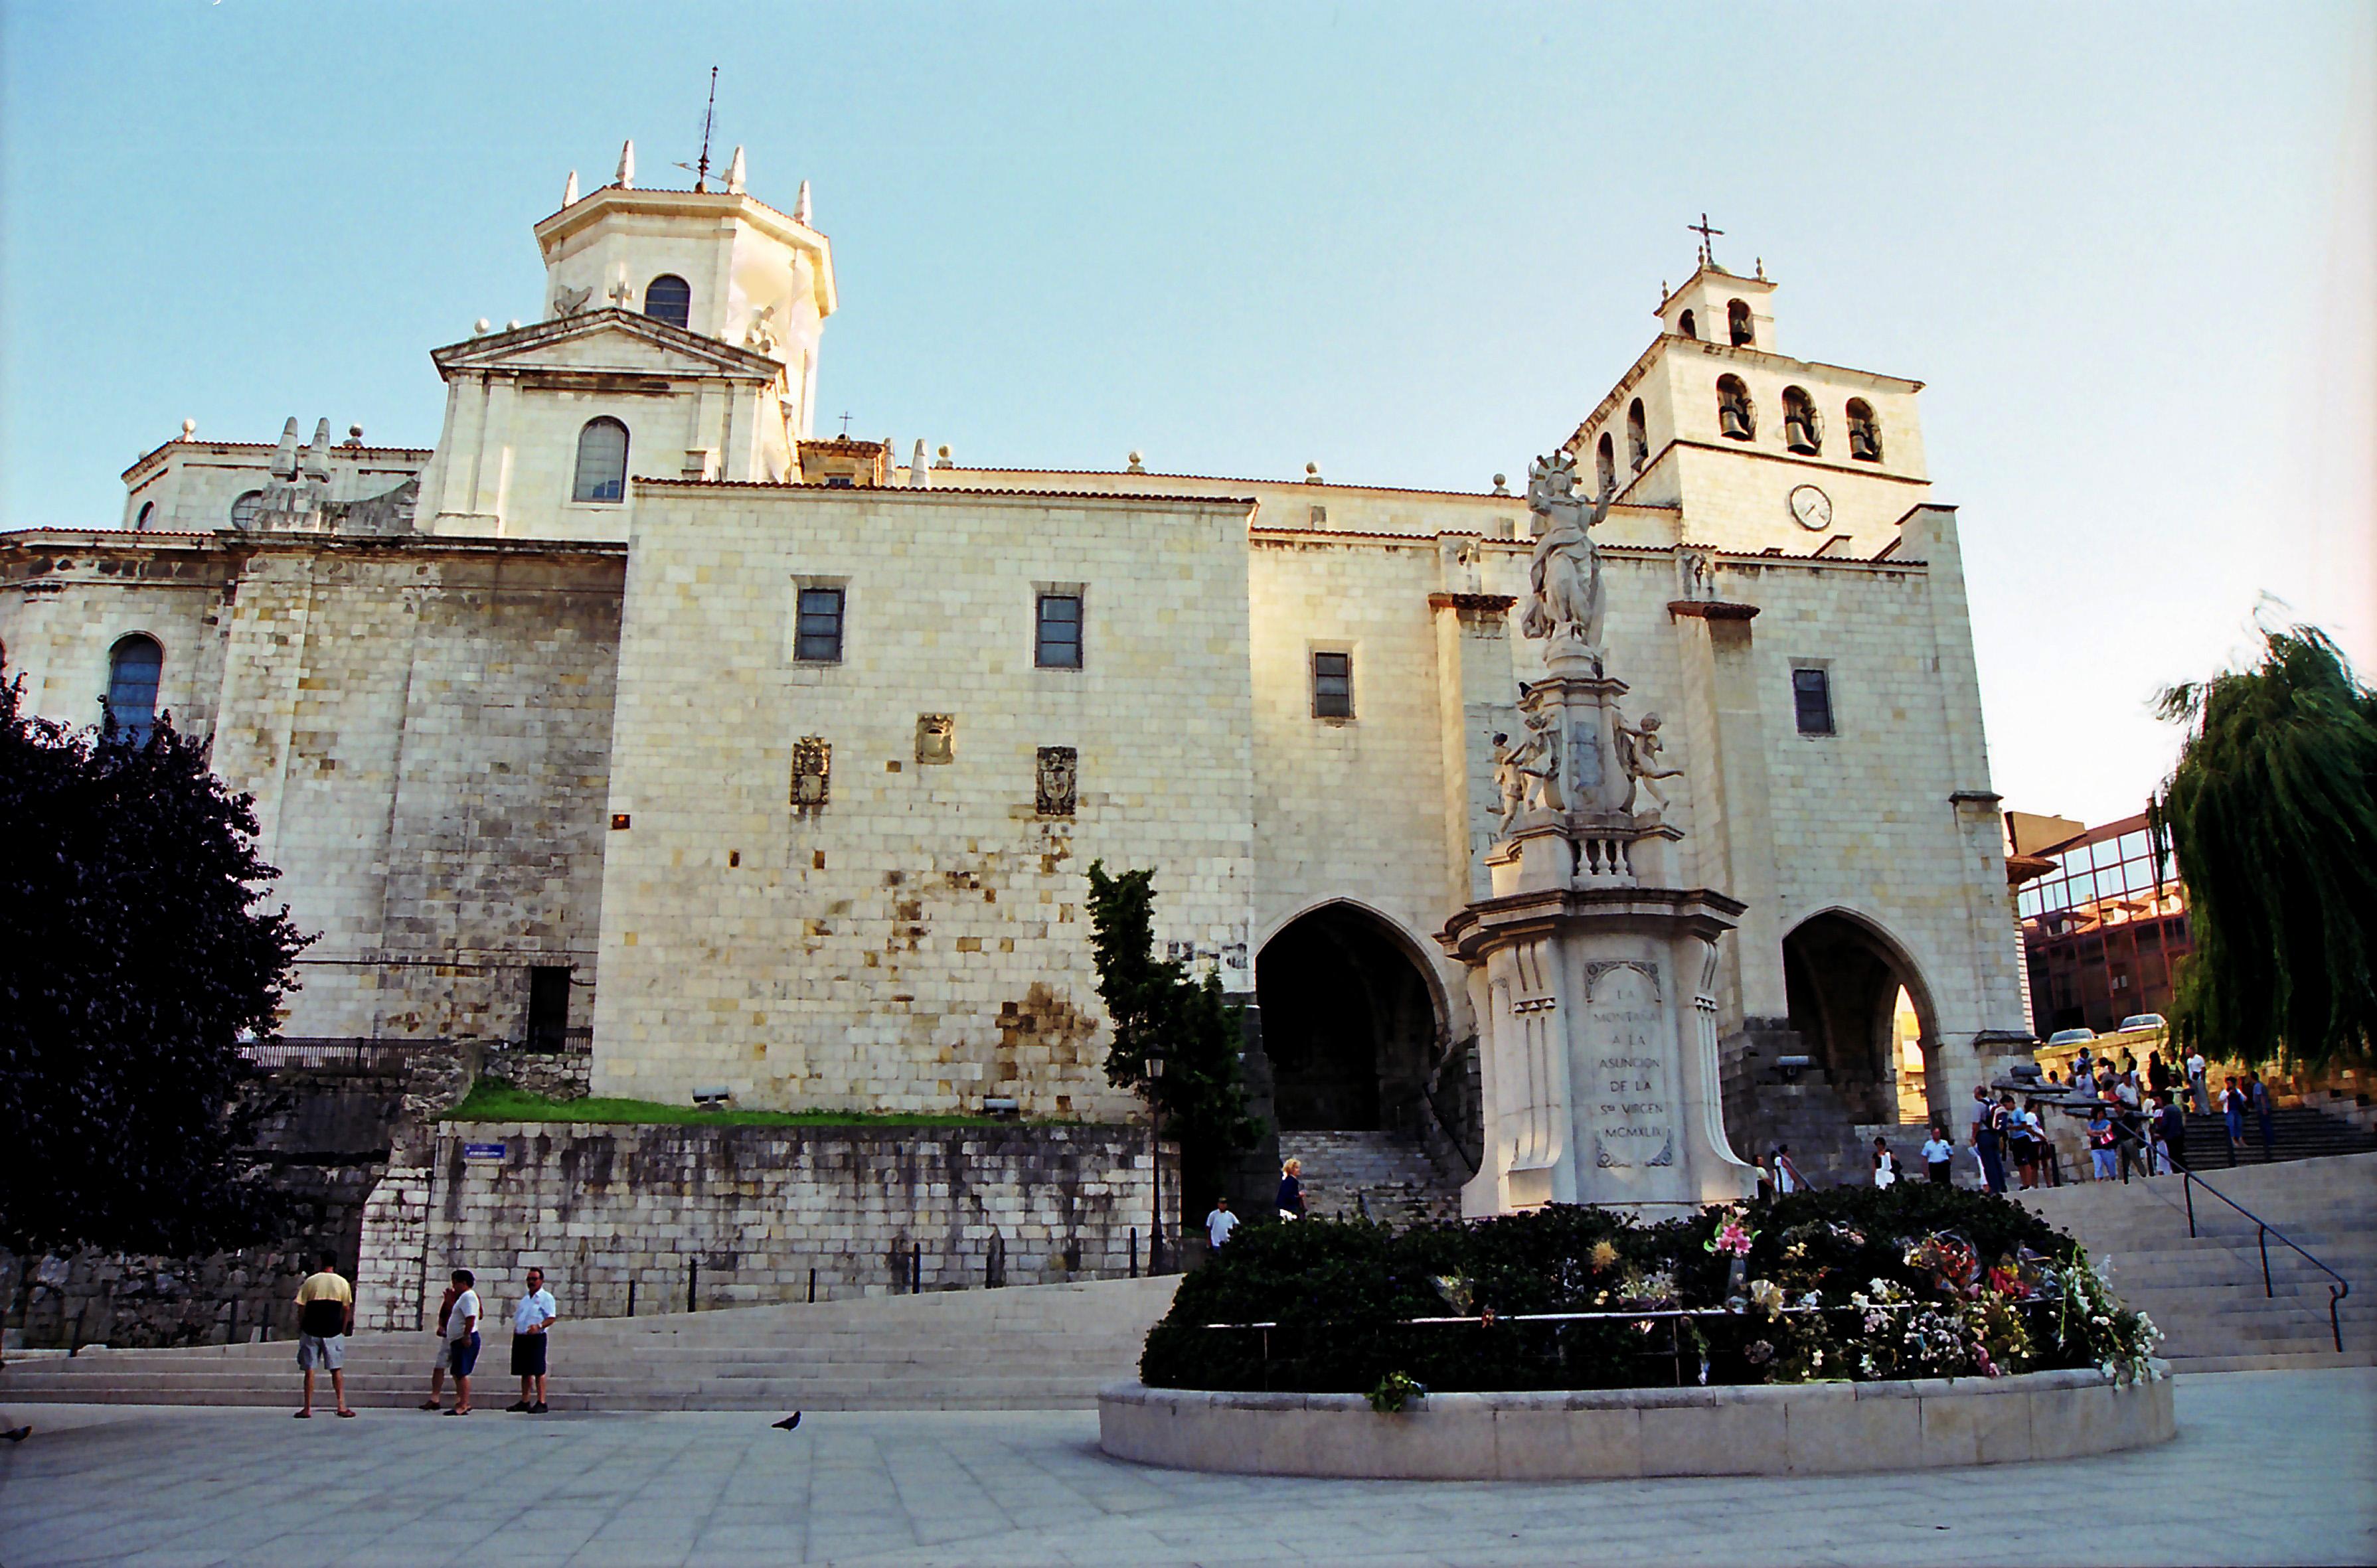 Catedral de Santander - Wikipedia, la enciclopedia libre